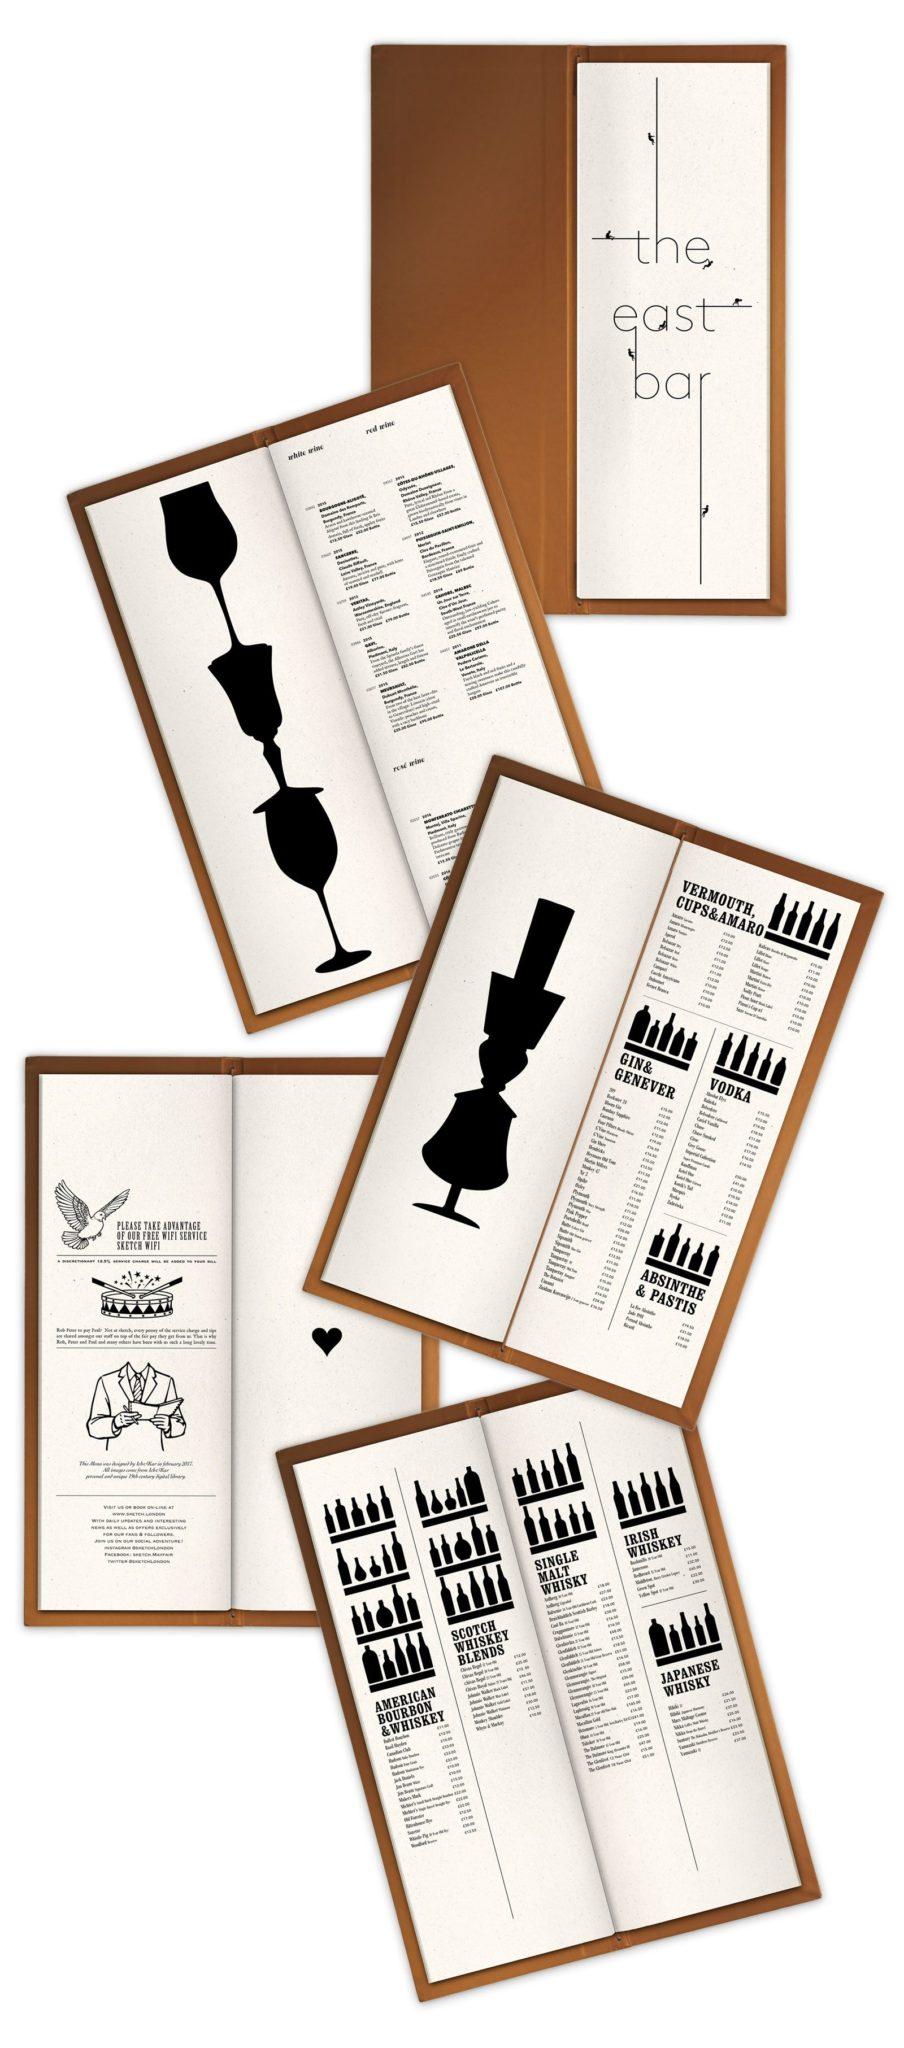 cartes cocktails sketch london cocktails and spirits list ichetkar silhouette